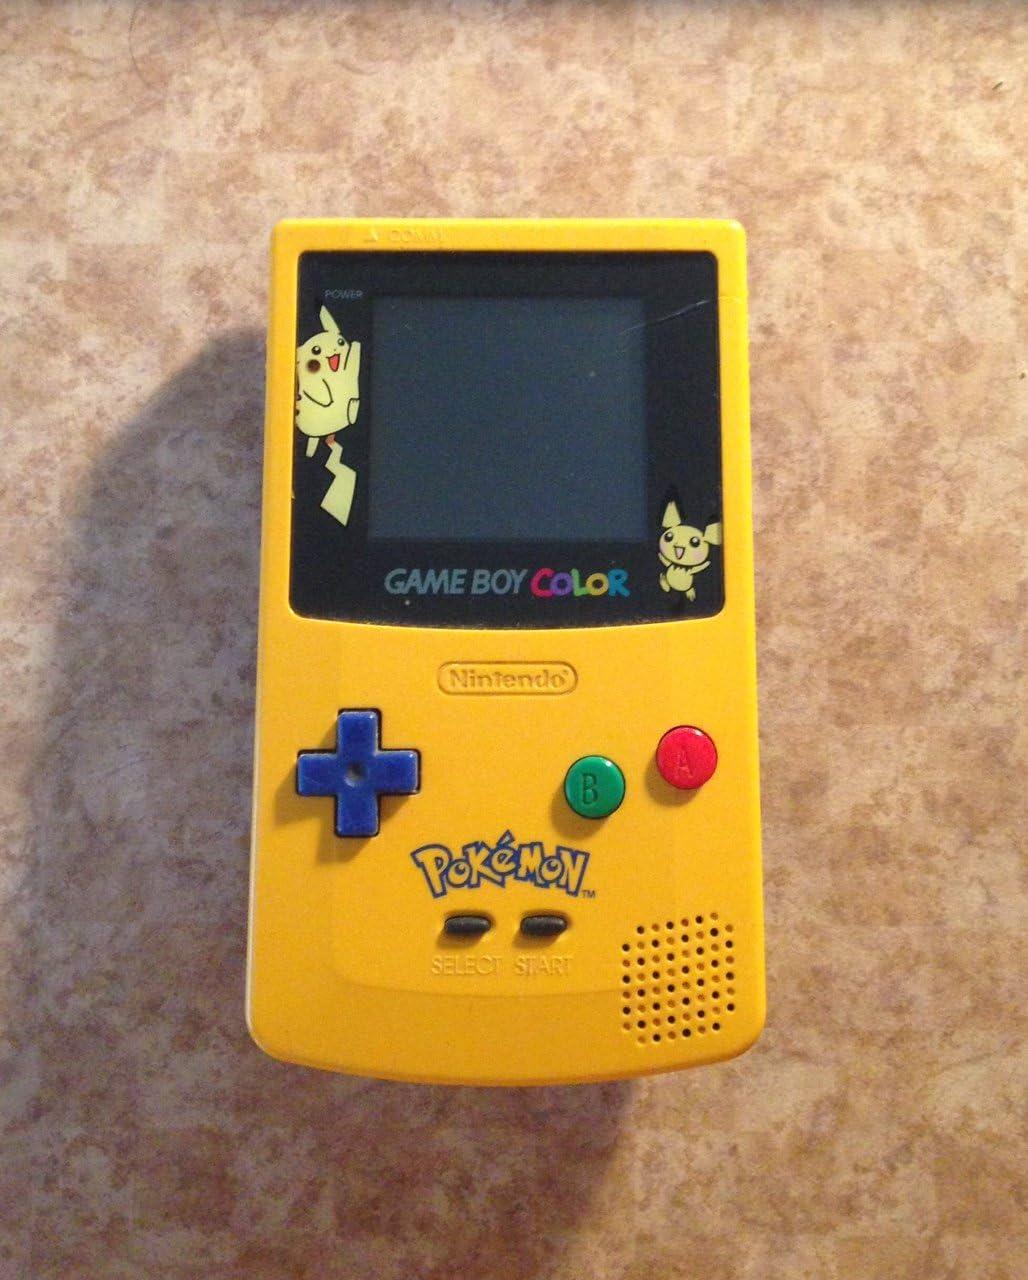 Nintendo game boy color youtube - Amazon Com Game Boy Color Limited Pokemon Edition Yellow Nintendo Game Boy Color Video Games